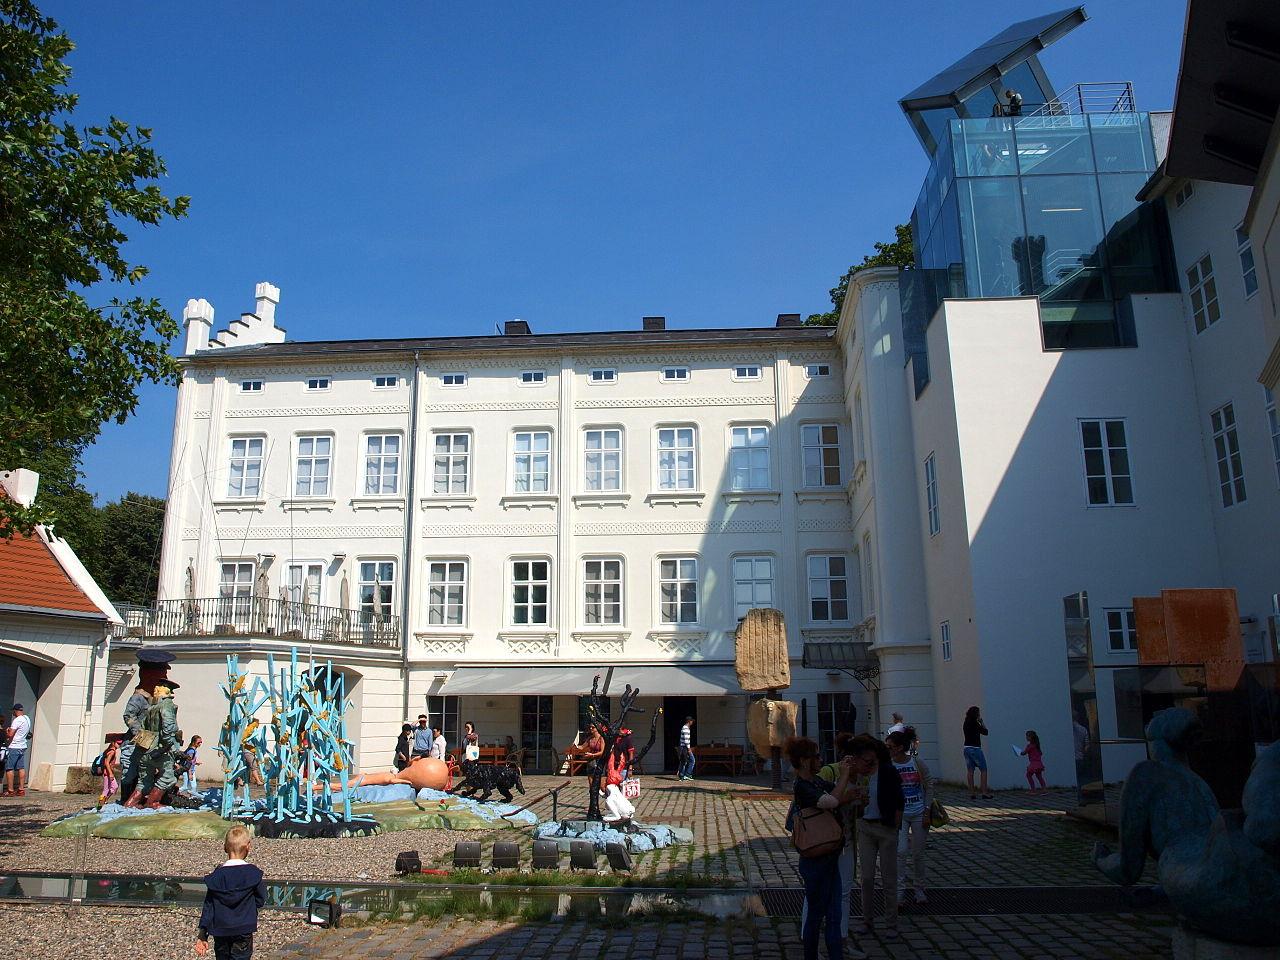 Музей Кампа, экспозиция во дворе